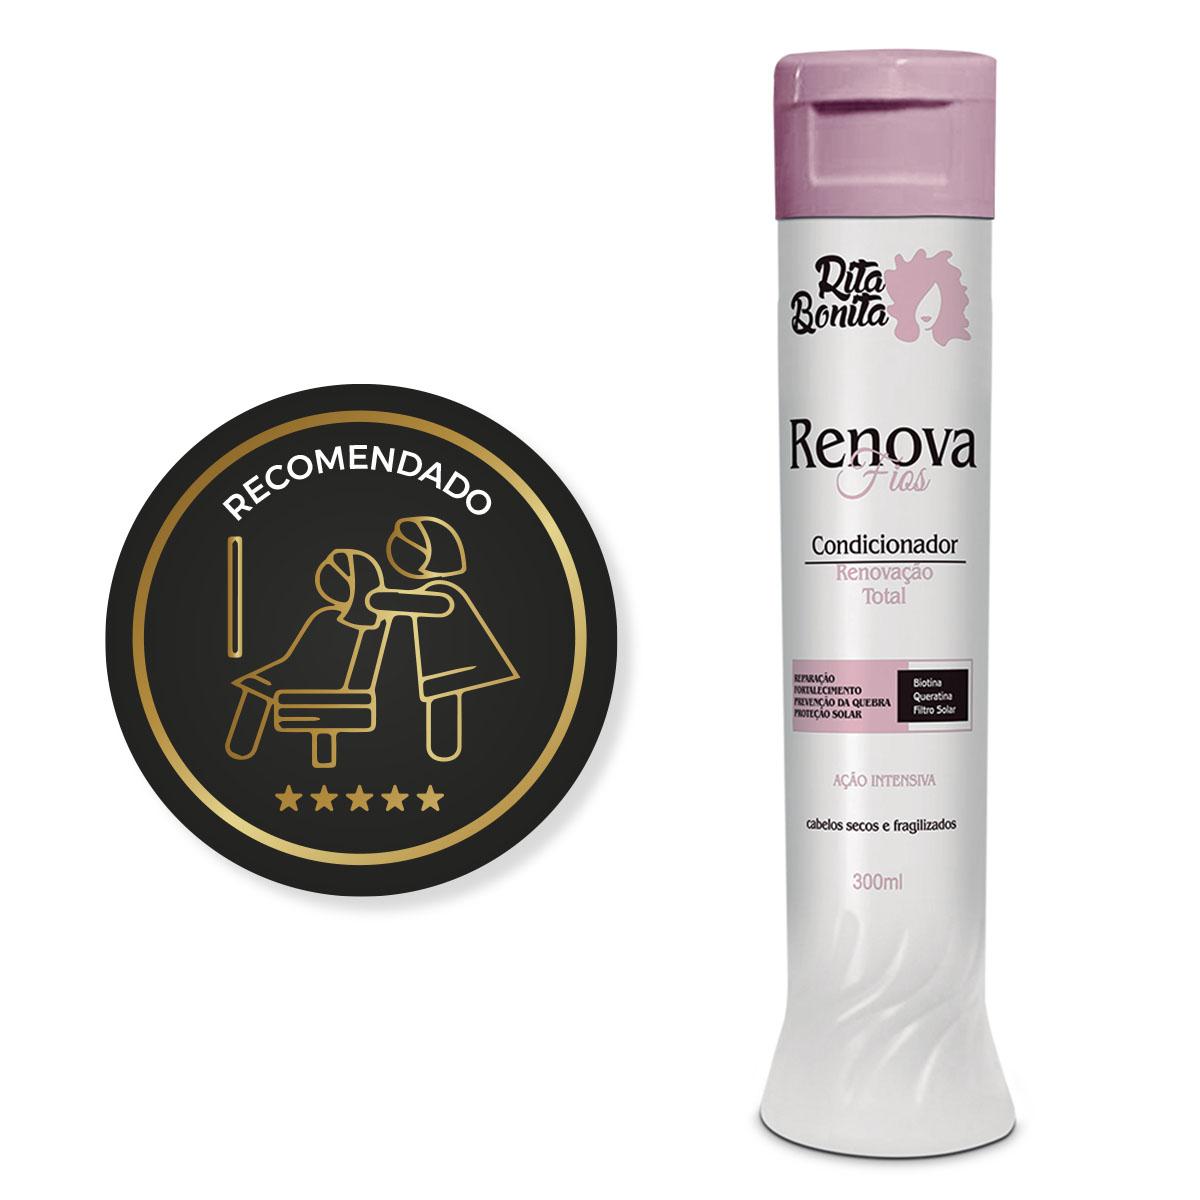 Renova Fios - Condicionador Rita Bonita 300ml